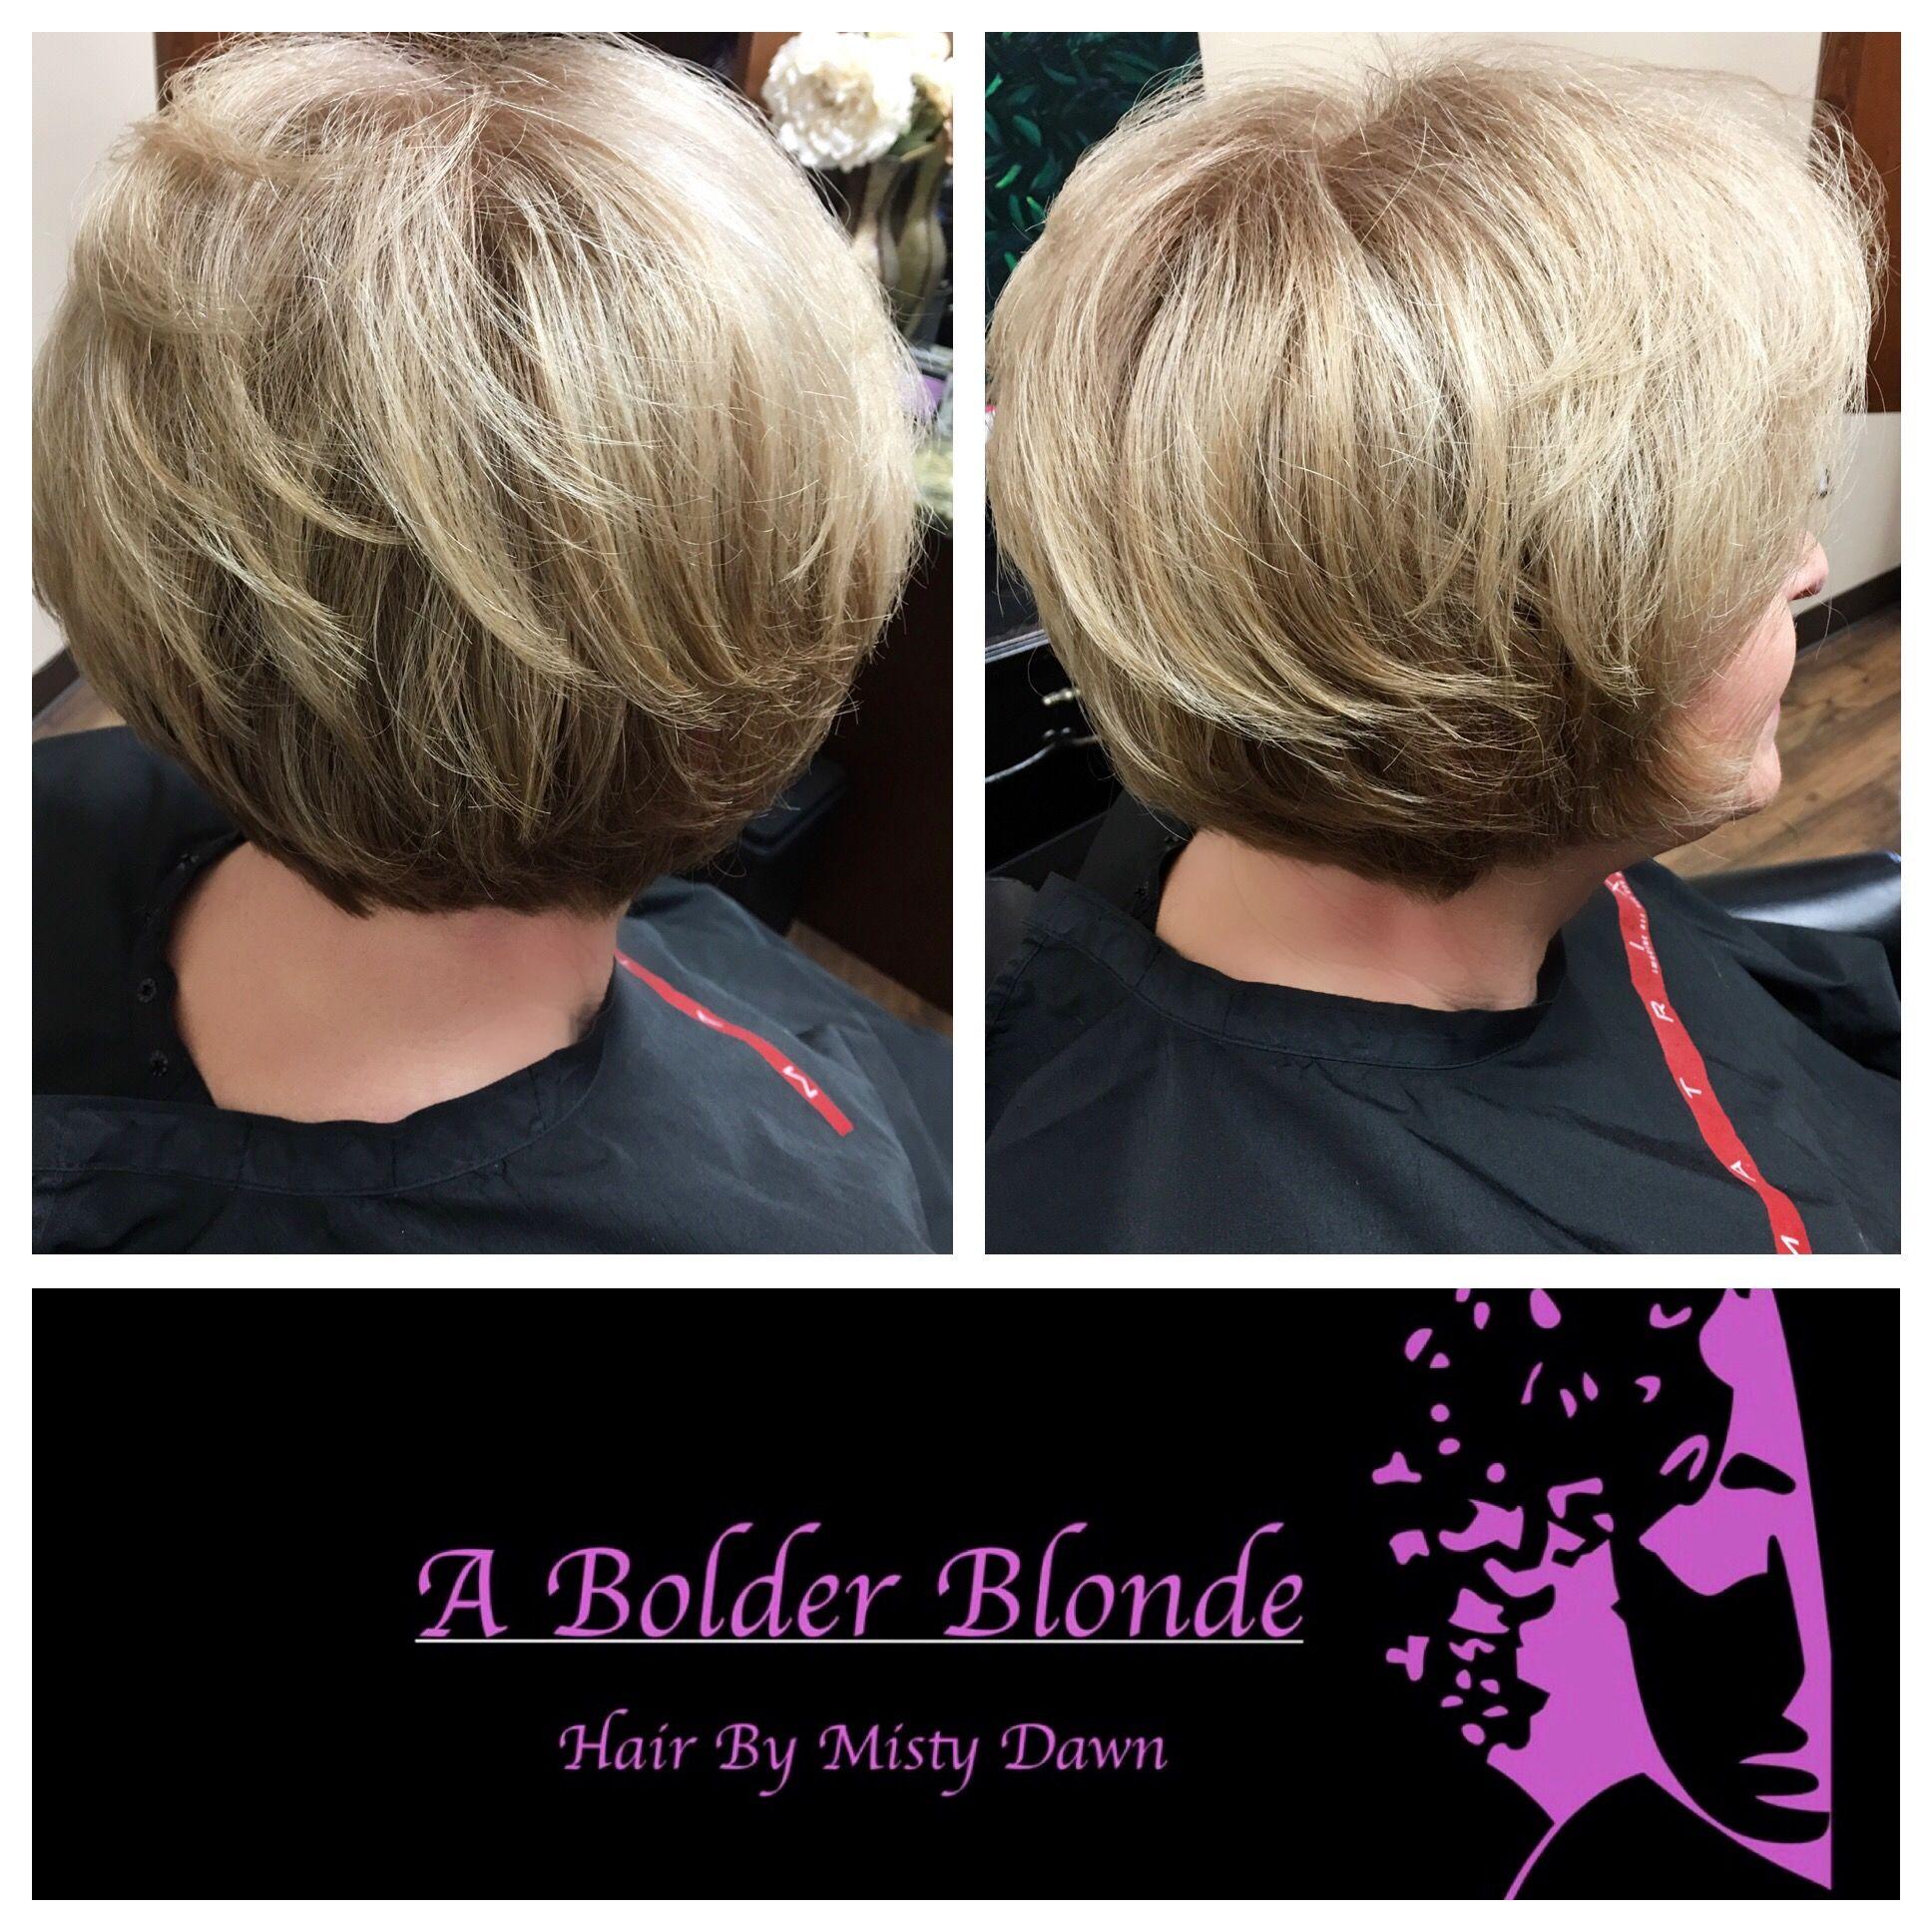 Abolderblonde mistydawn shorthair blondehair highlights